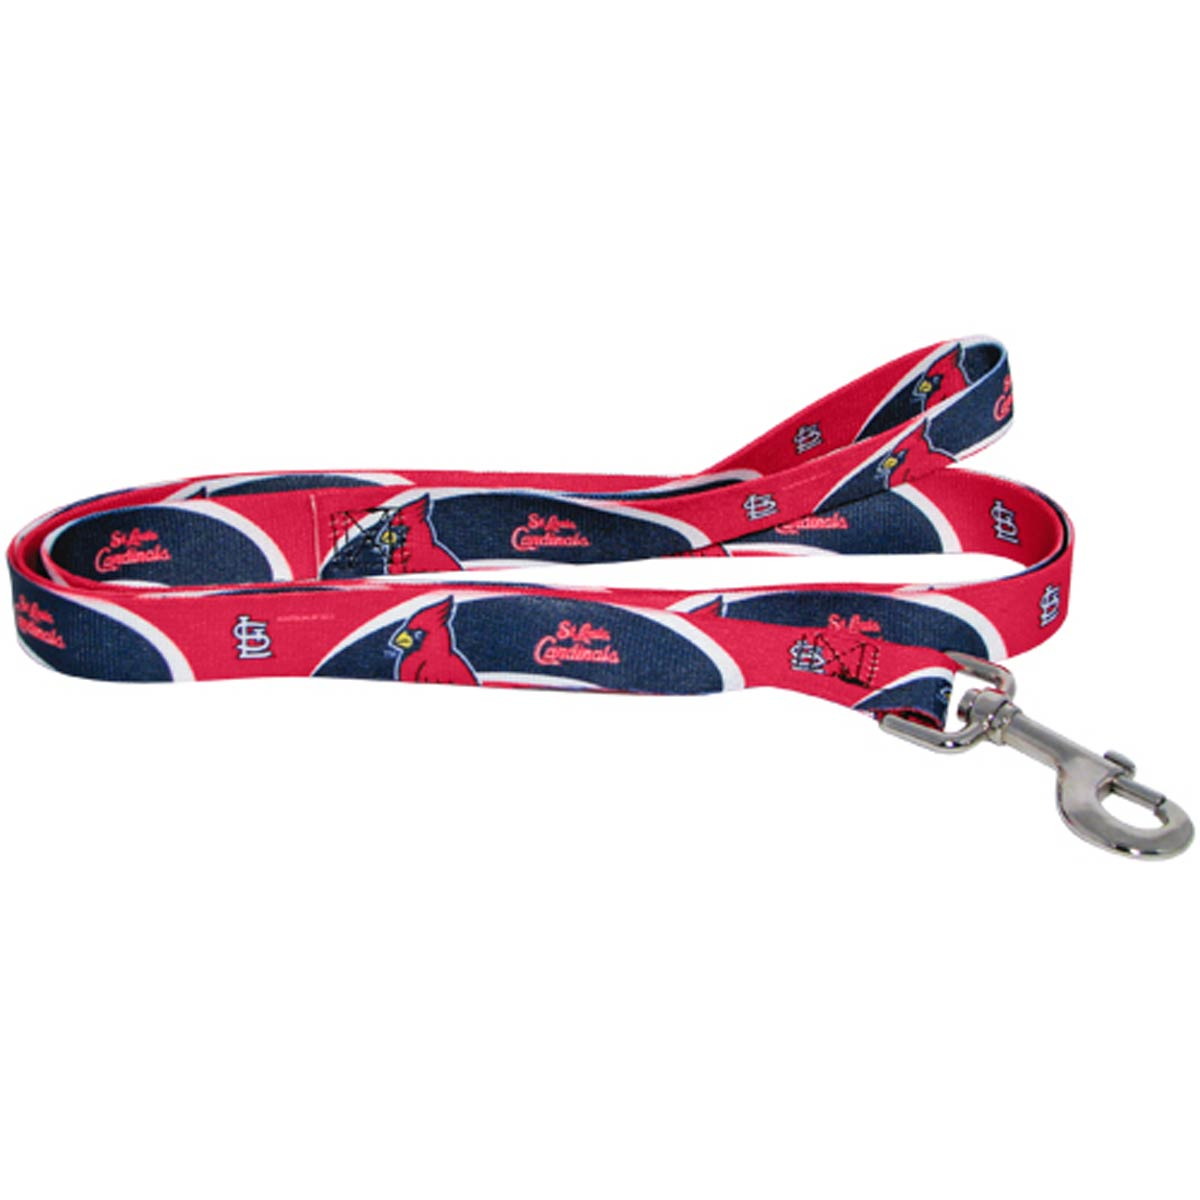 St. Louis Cardinals Baseball Printed Dog Leash